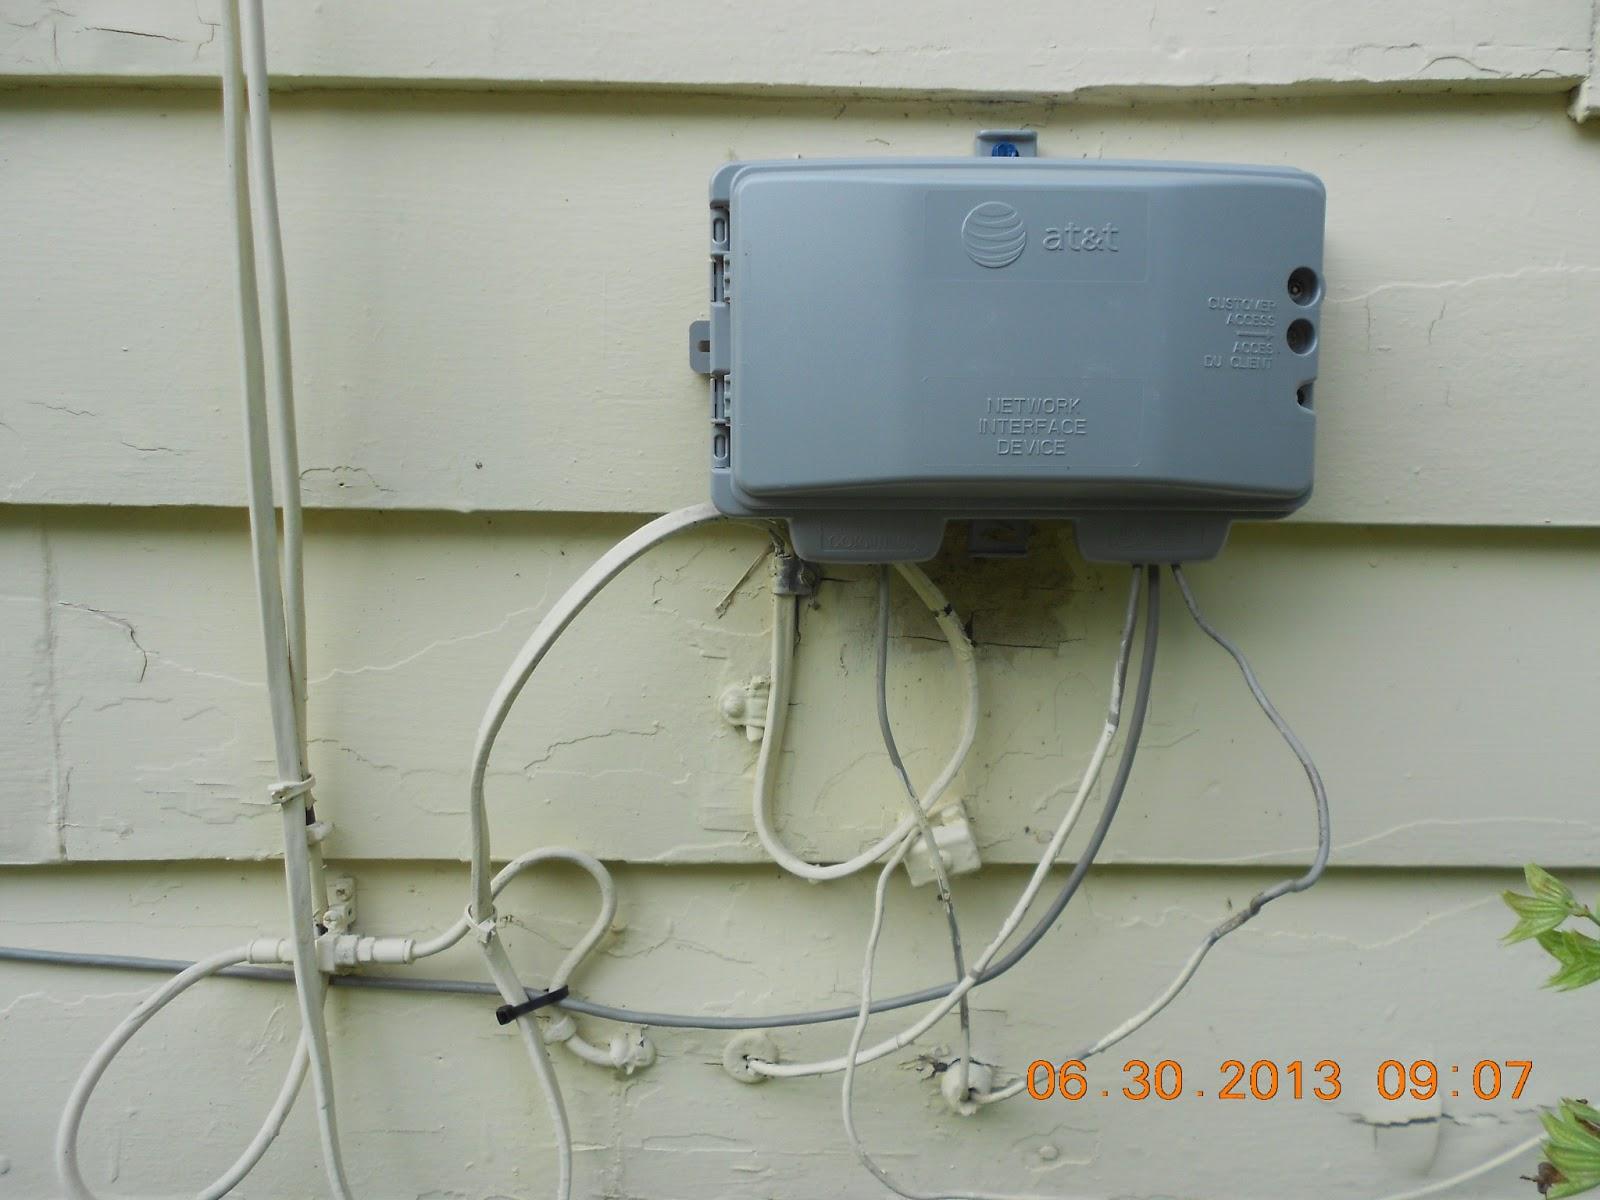 att nid box wiring wiring diagramat t nid box wiring diagram furthermore work interface device wiringatt nid box wiring control cables